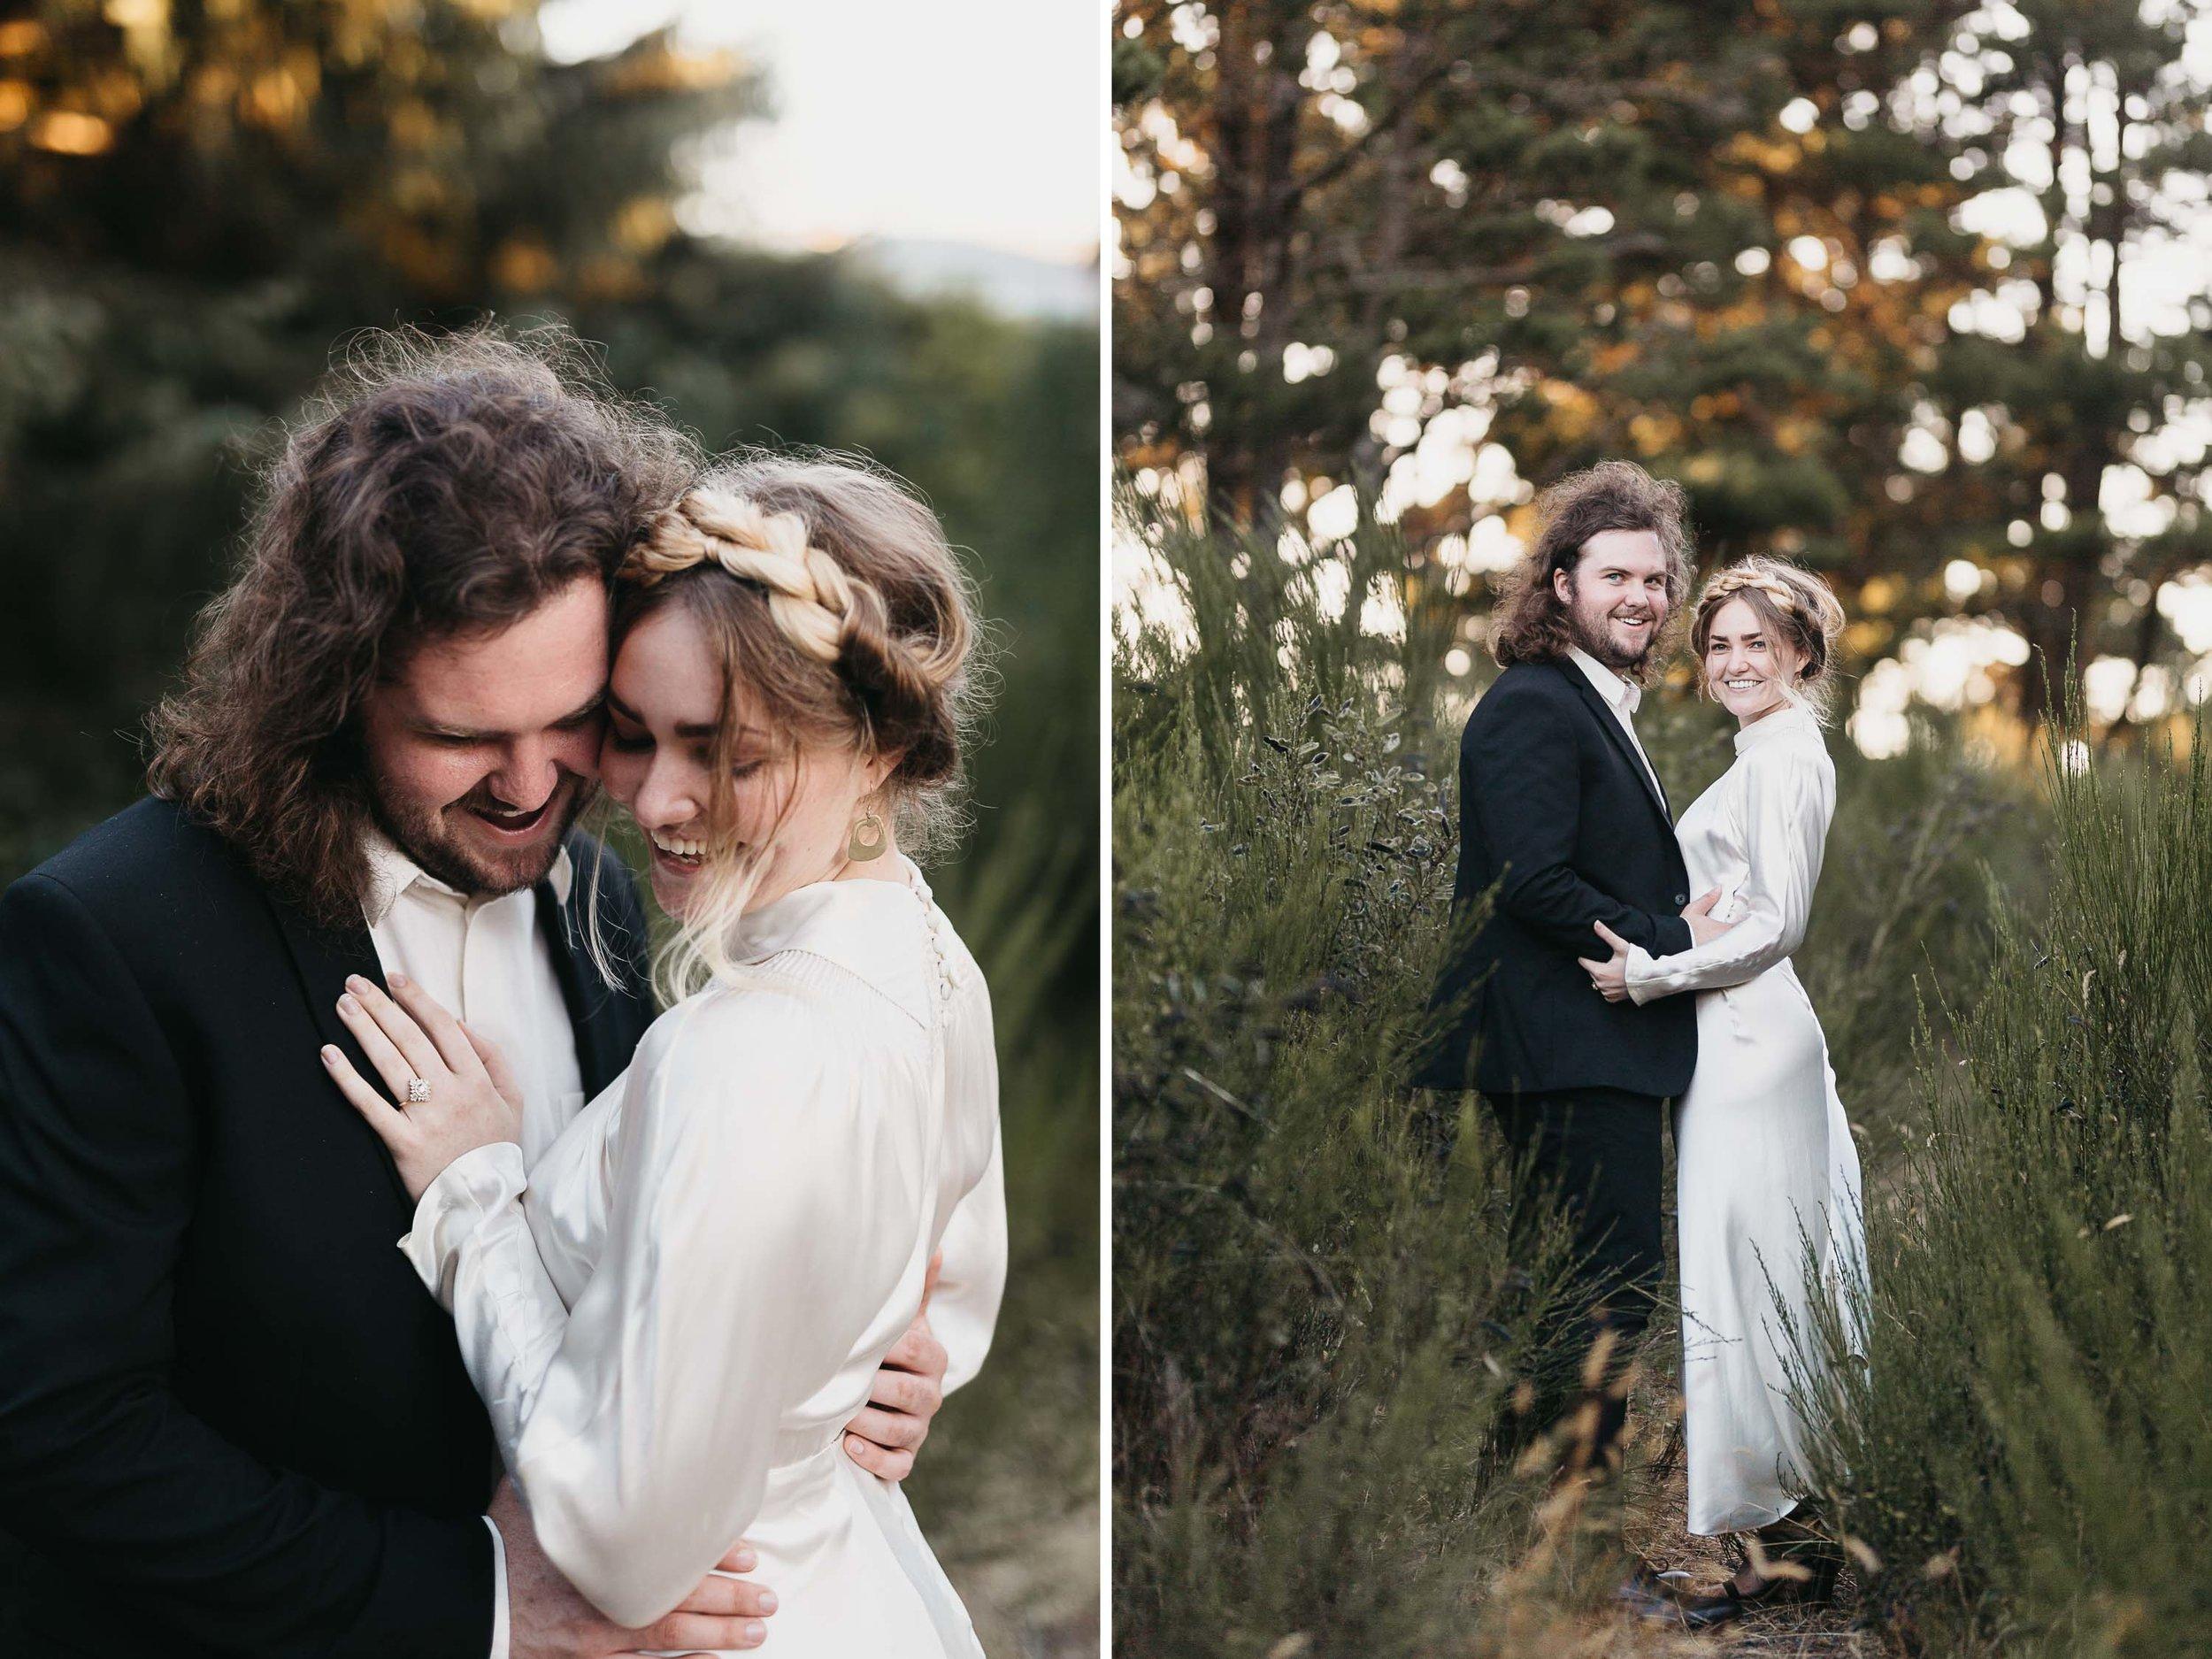 Oregon-Wedding-Photographer-03.jpg